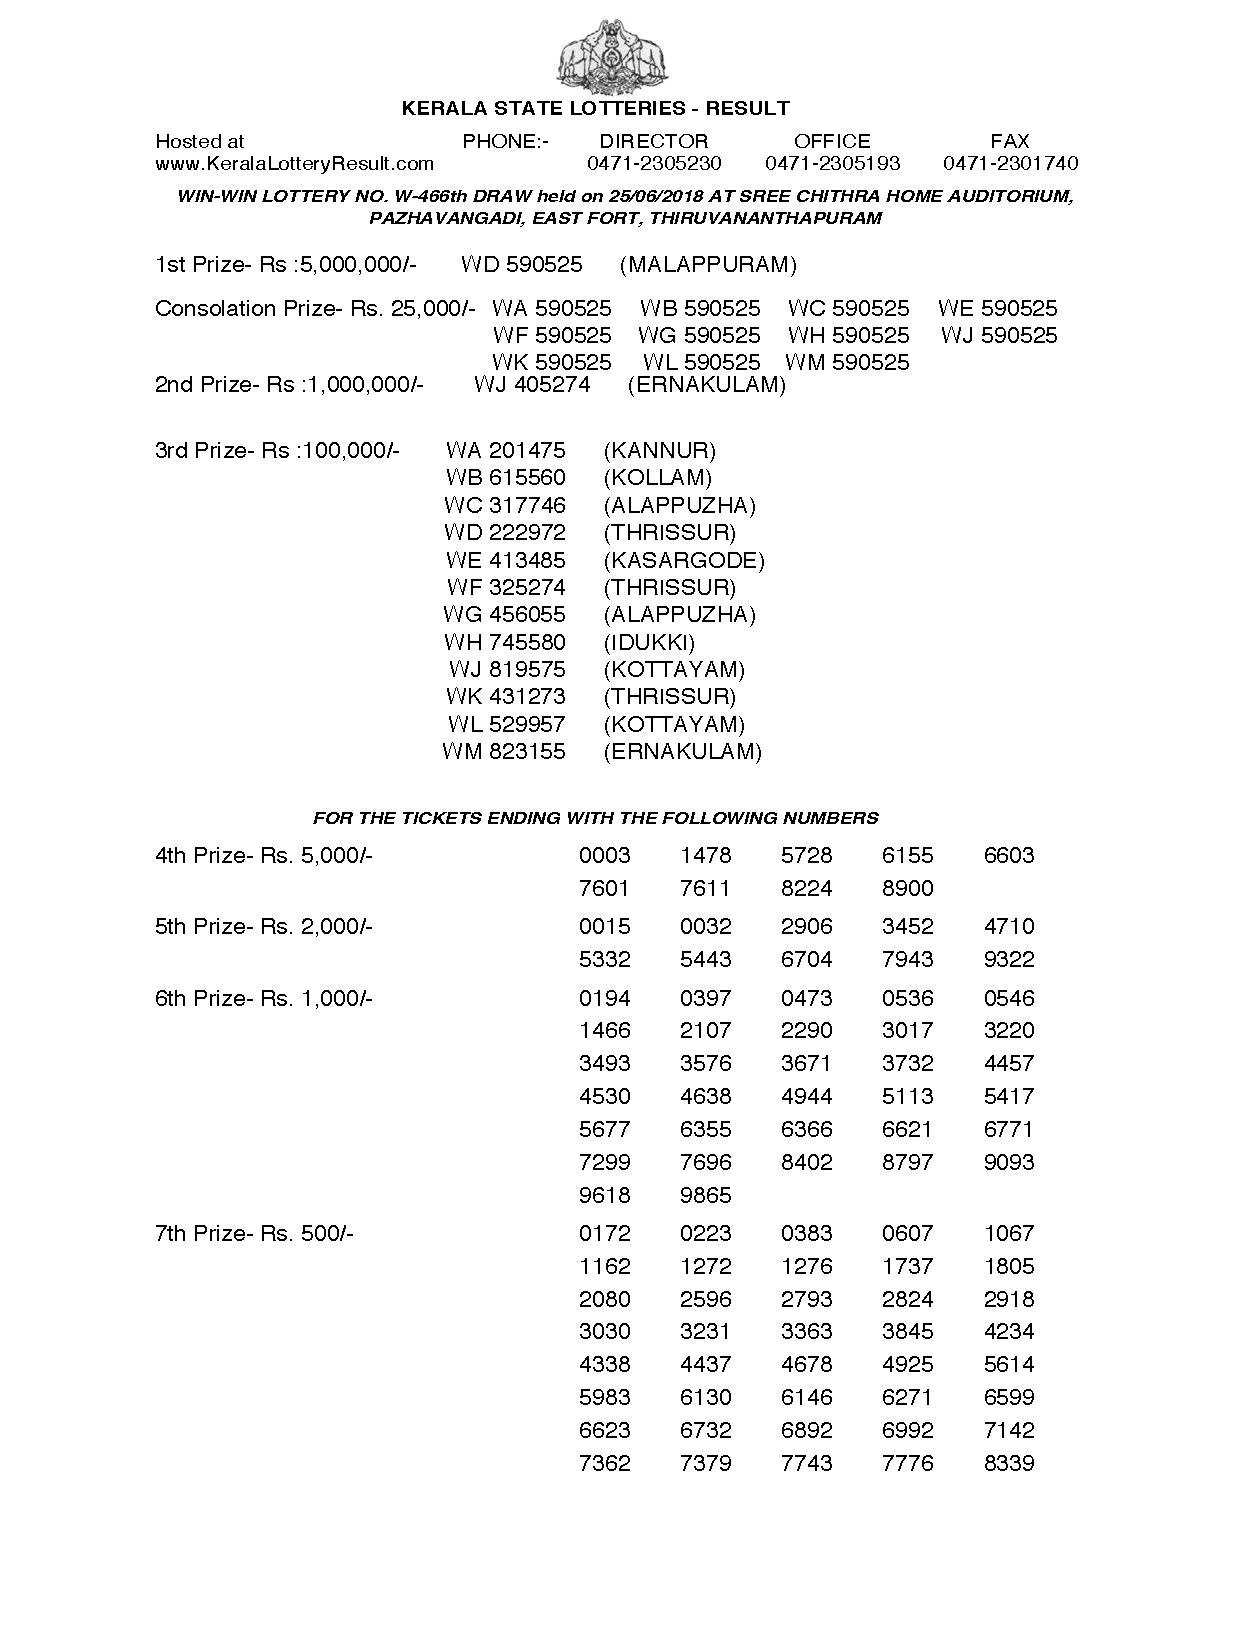 Winwin W466 Kerala Lottery Results Screenshot: Page 1